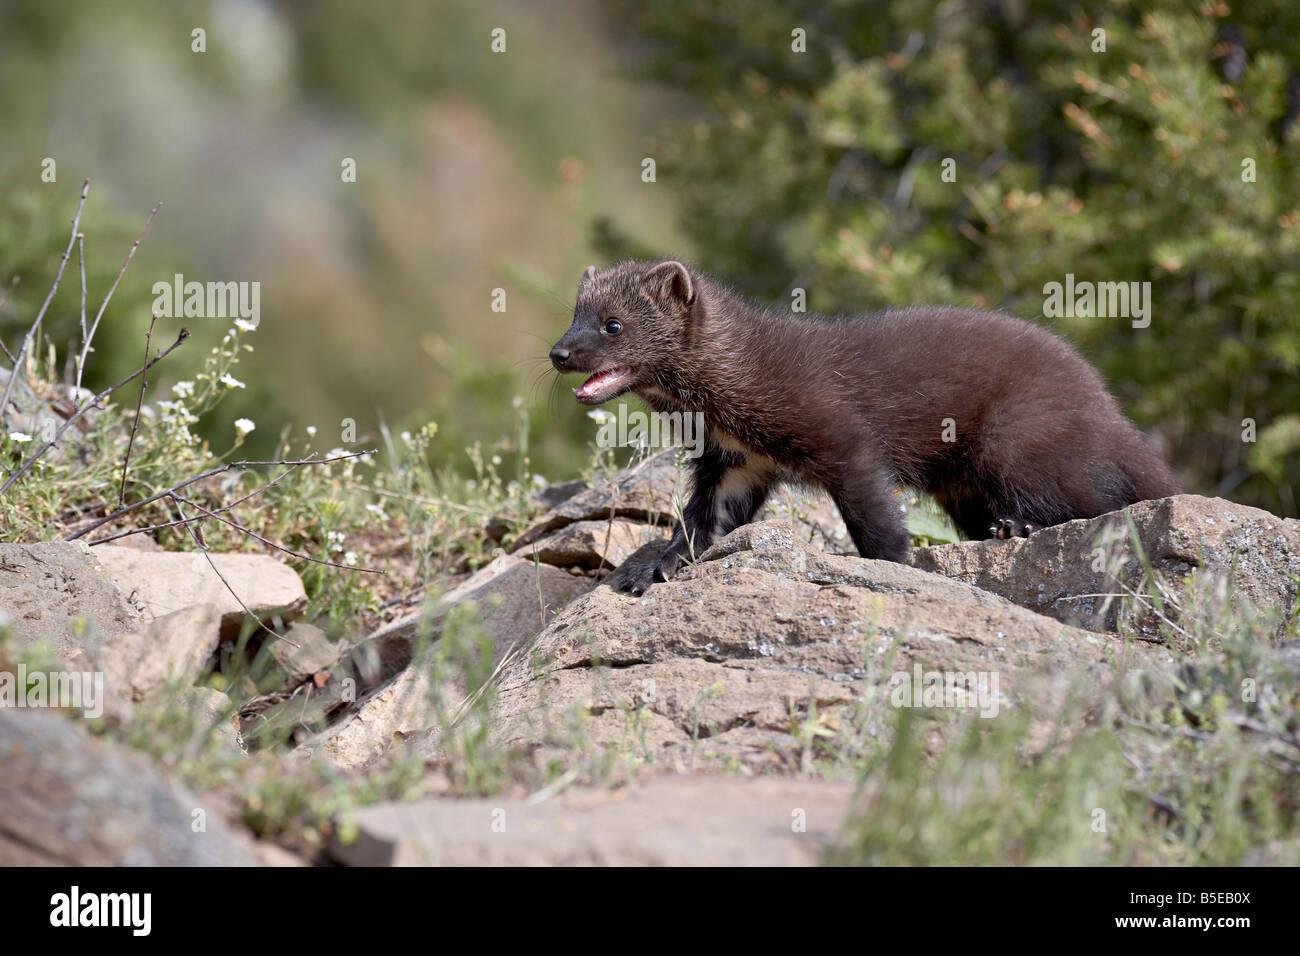 Baby fisher (Martes pennanti) in captivity, Animals of Montana, Bozeman, Montana, USA, North America - Stock Image